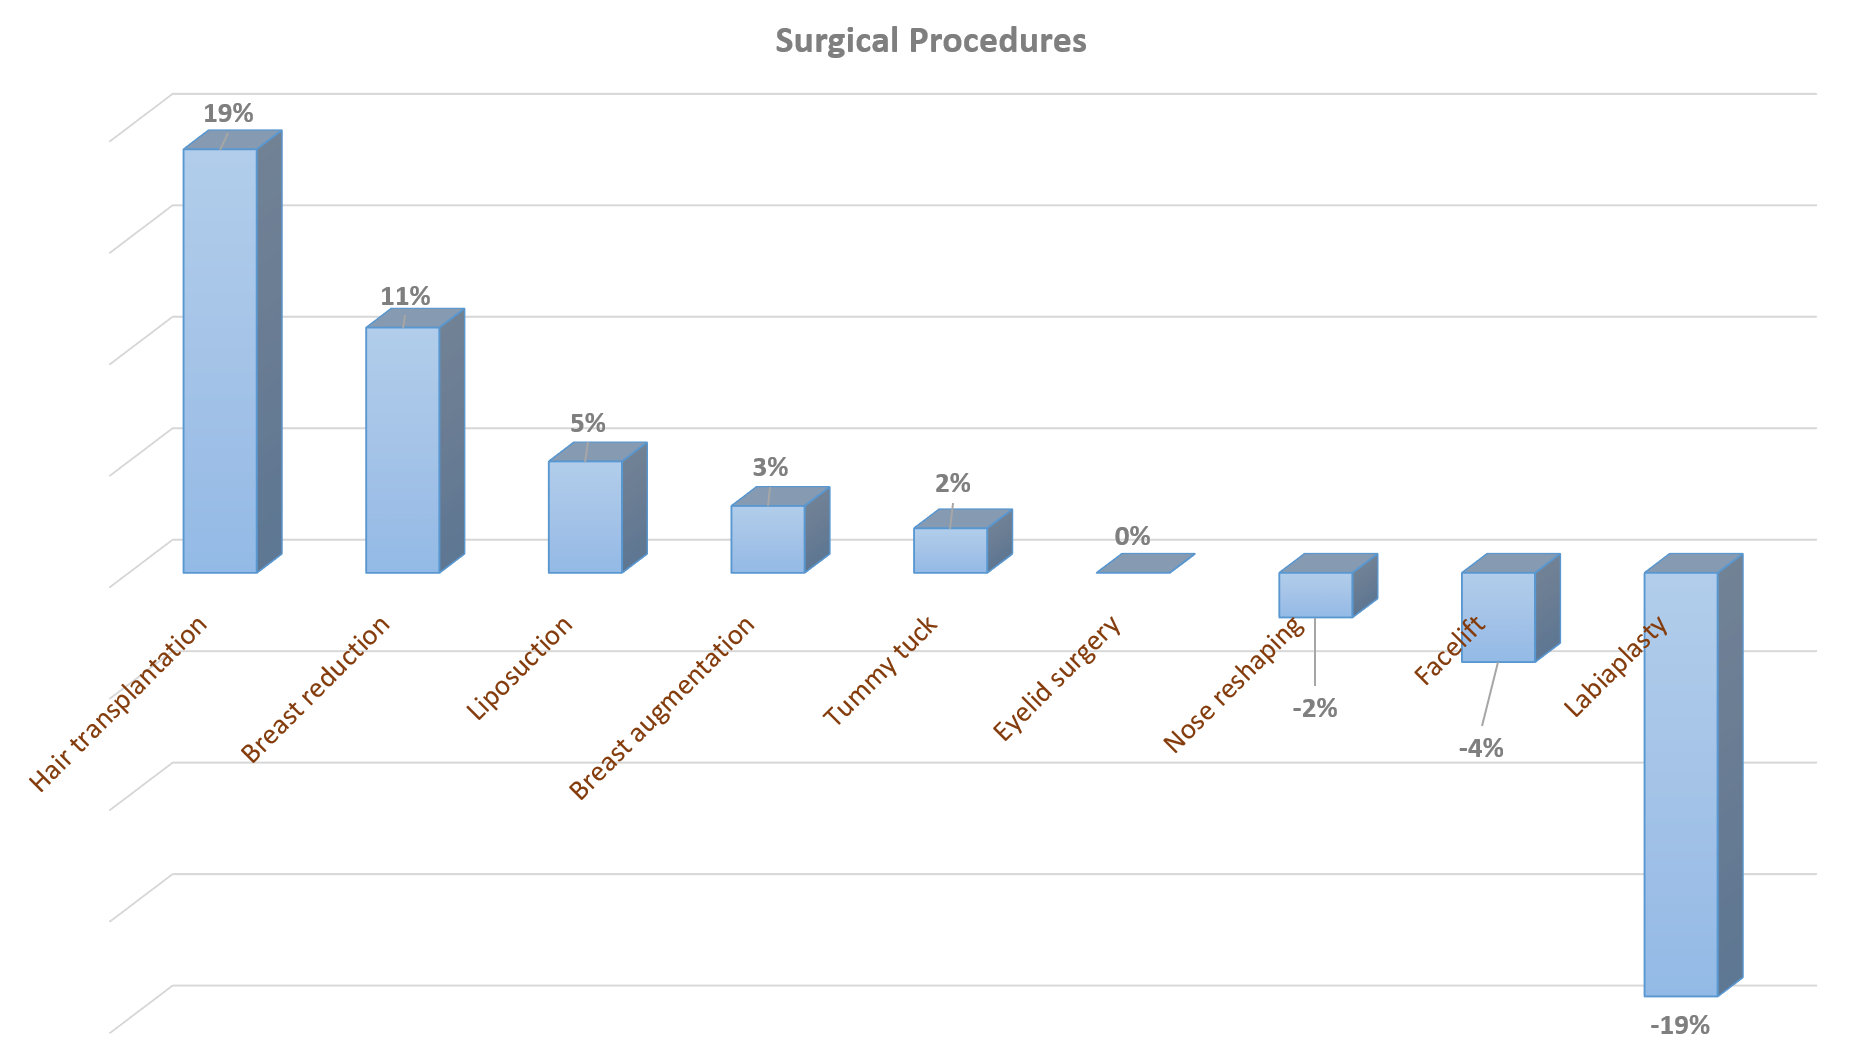 ASPS Chart 1